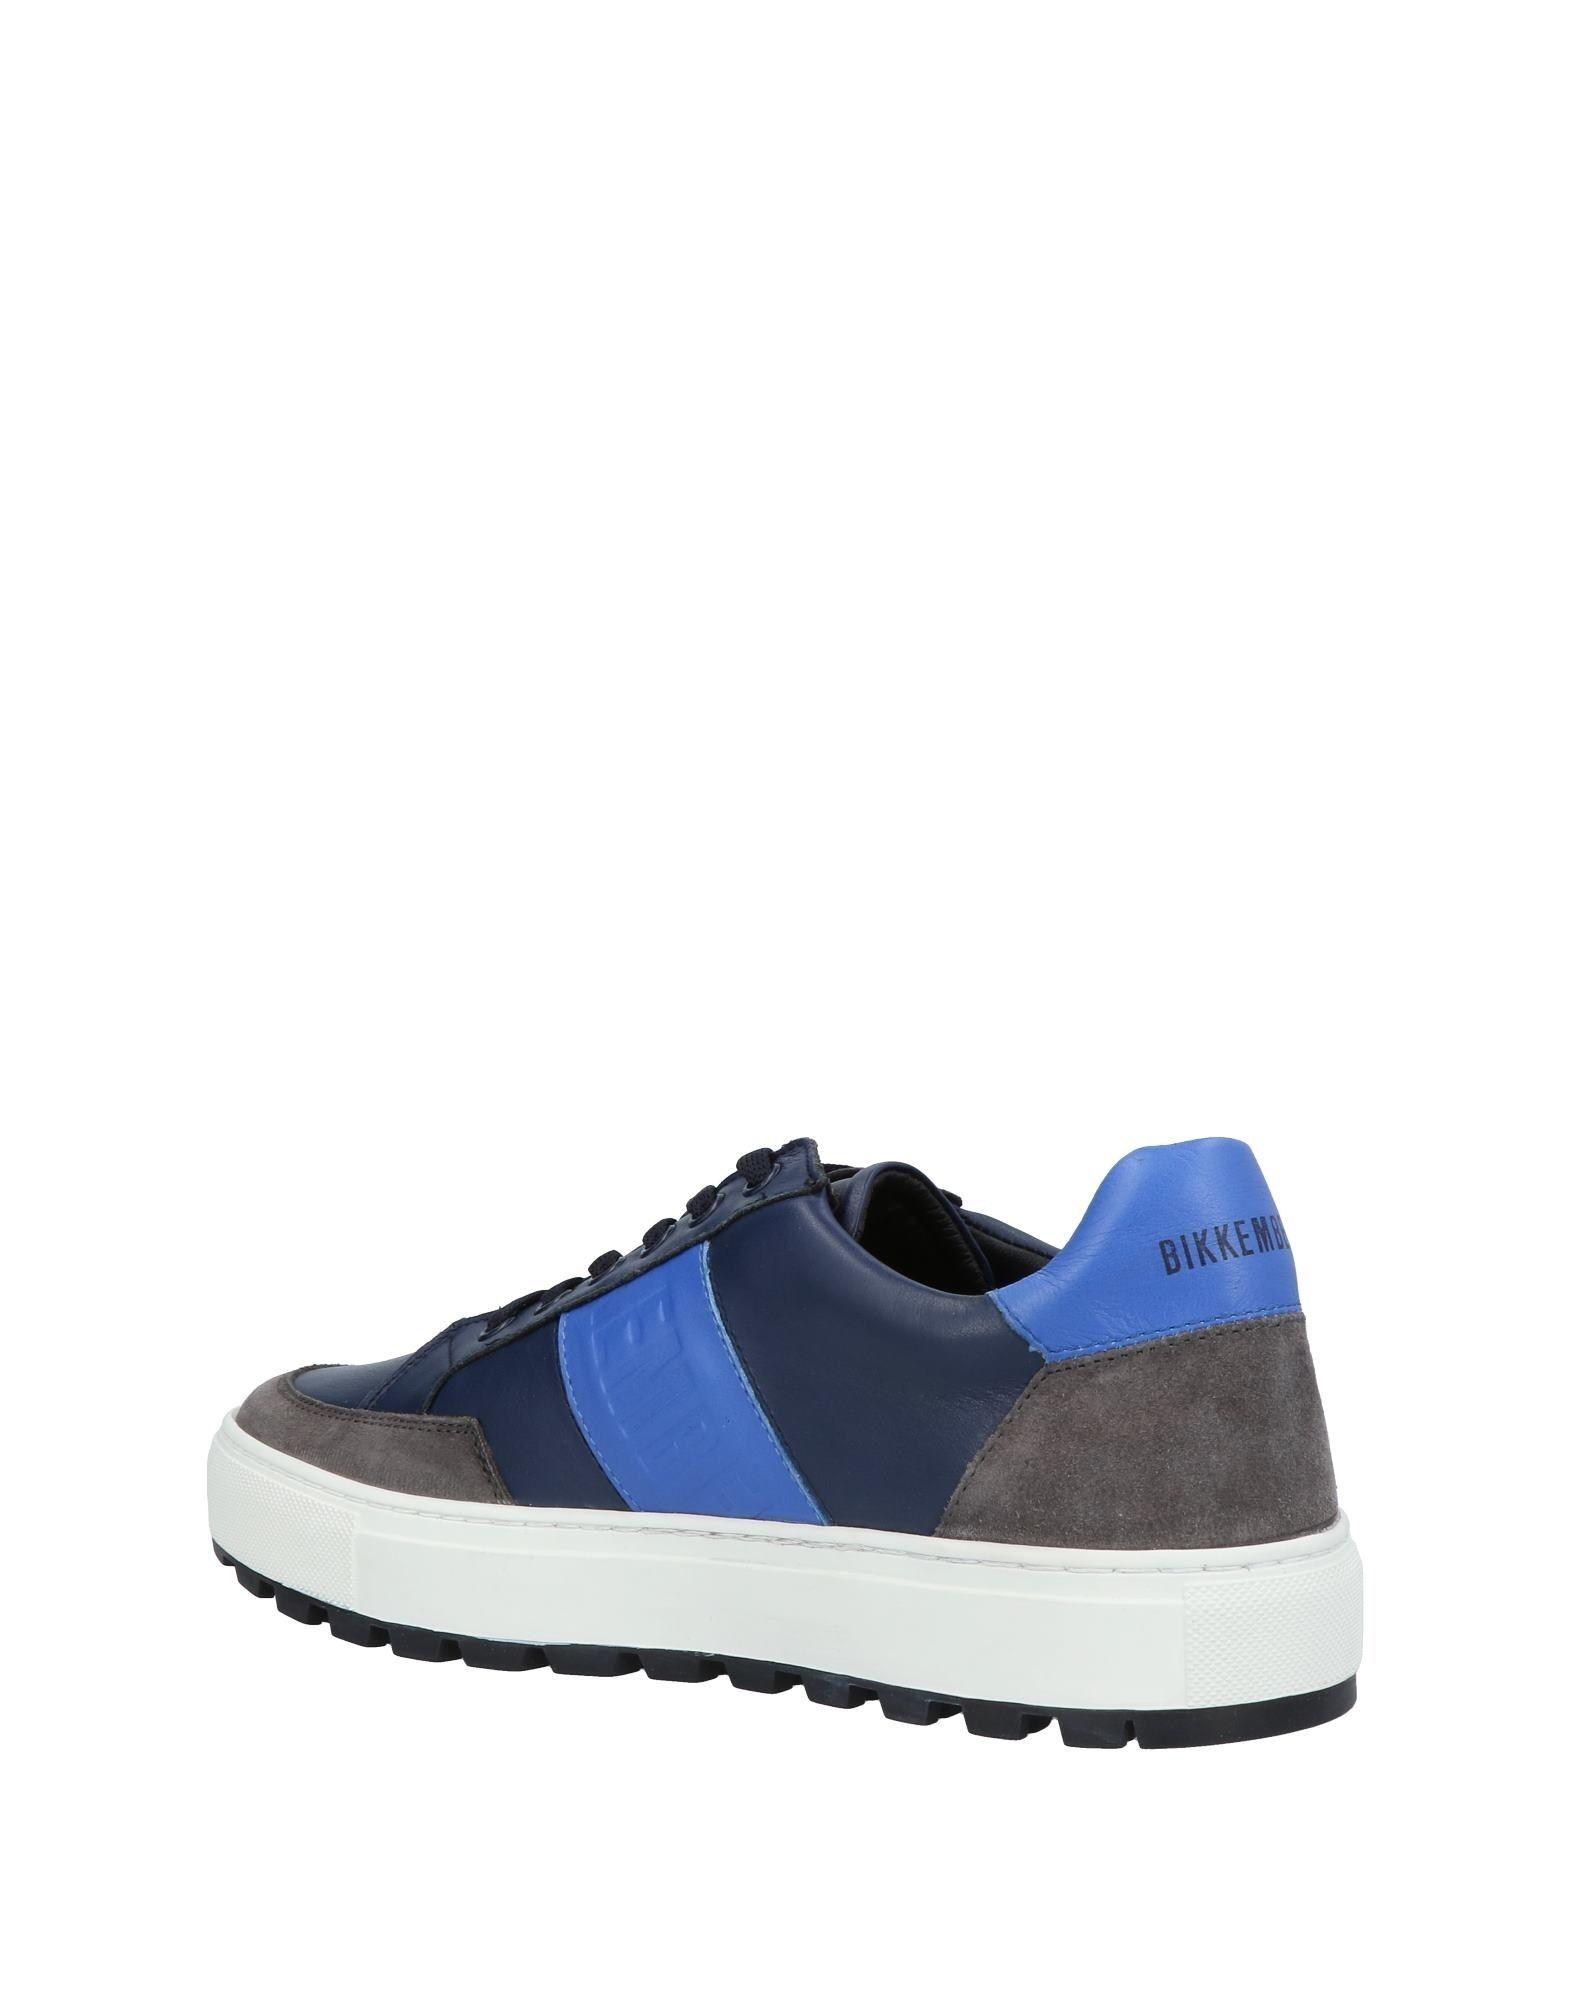 Bikkembergs Sneakers Herren  11450966PI Gute Qualität beliebte Schuhe